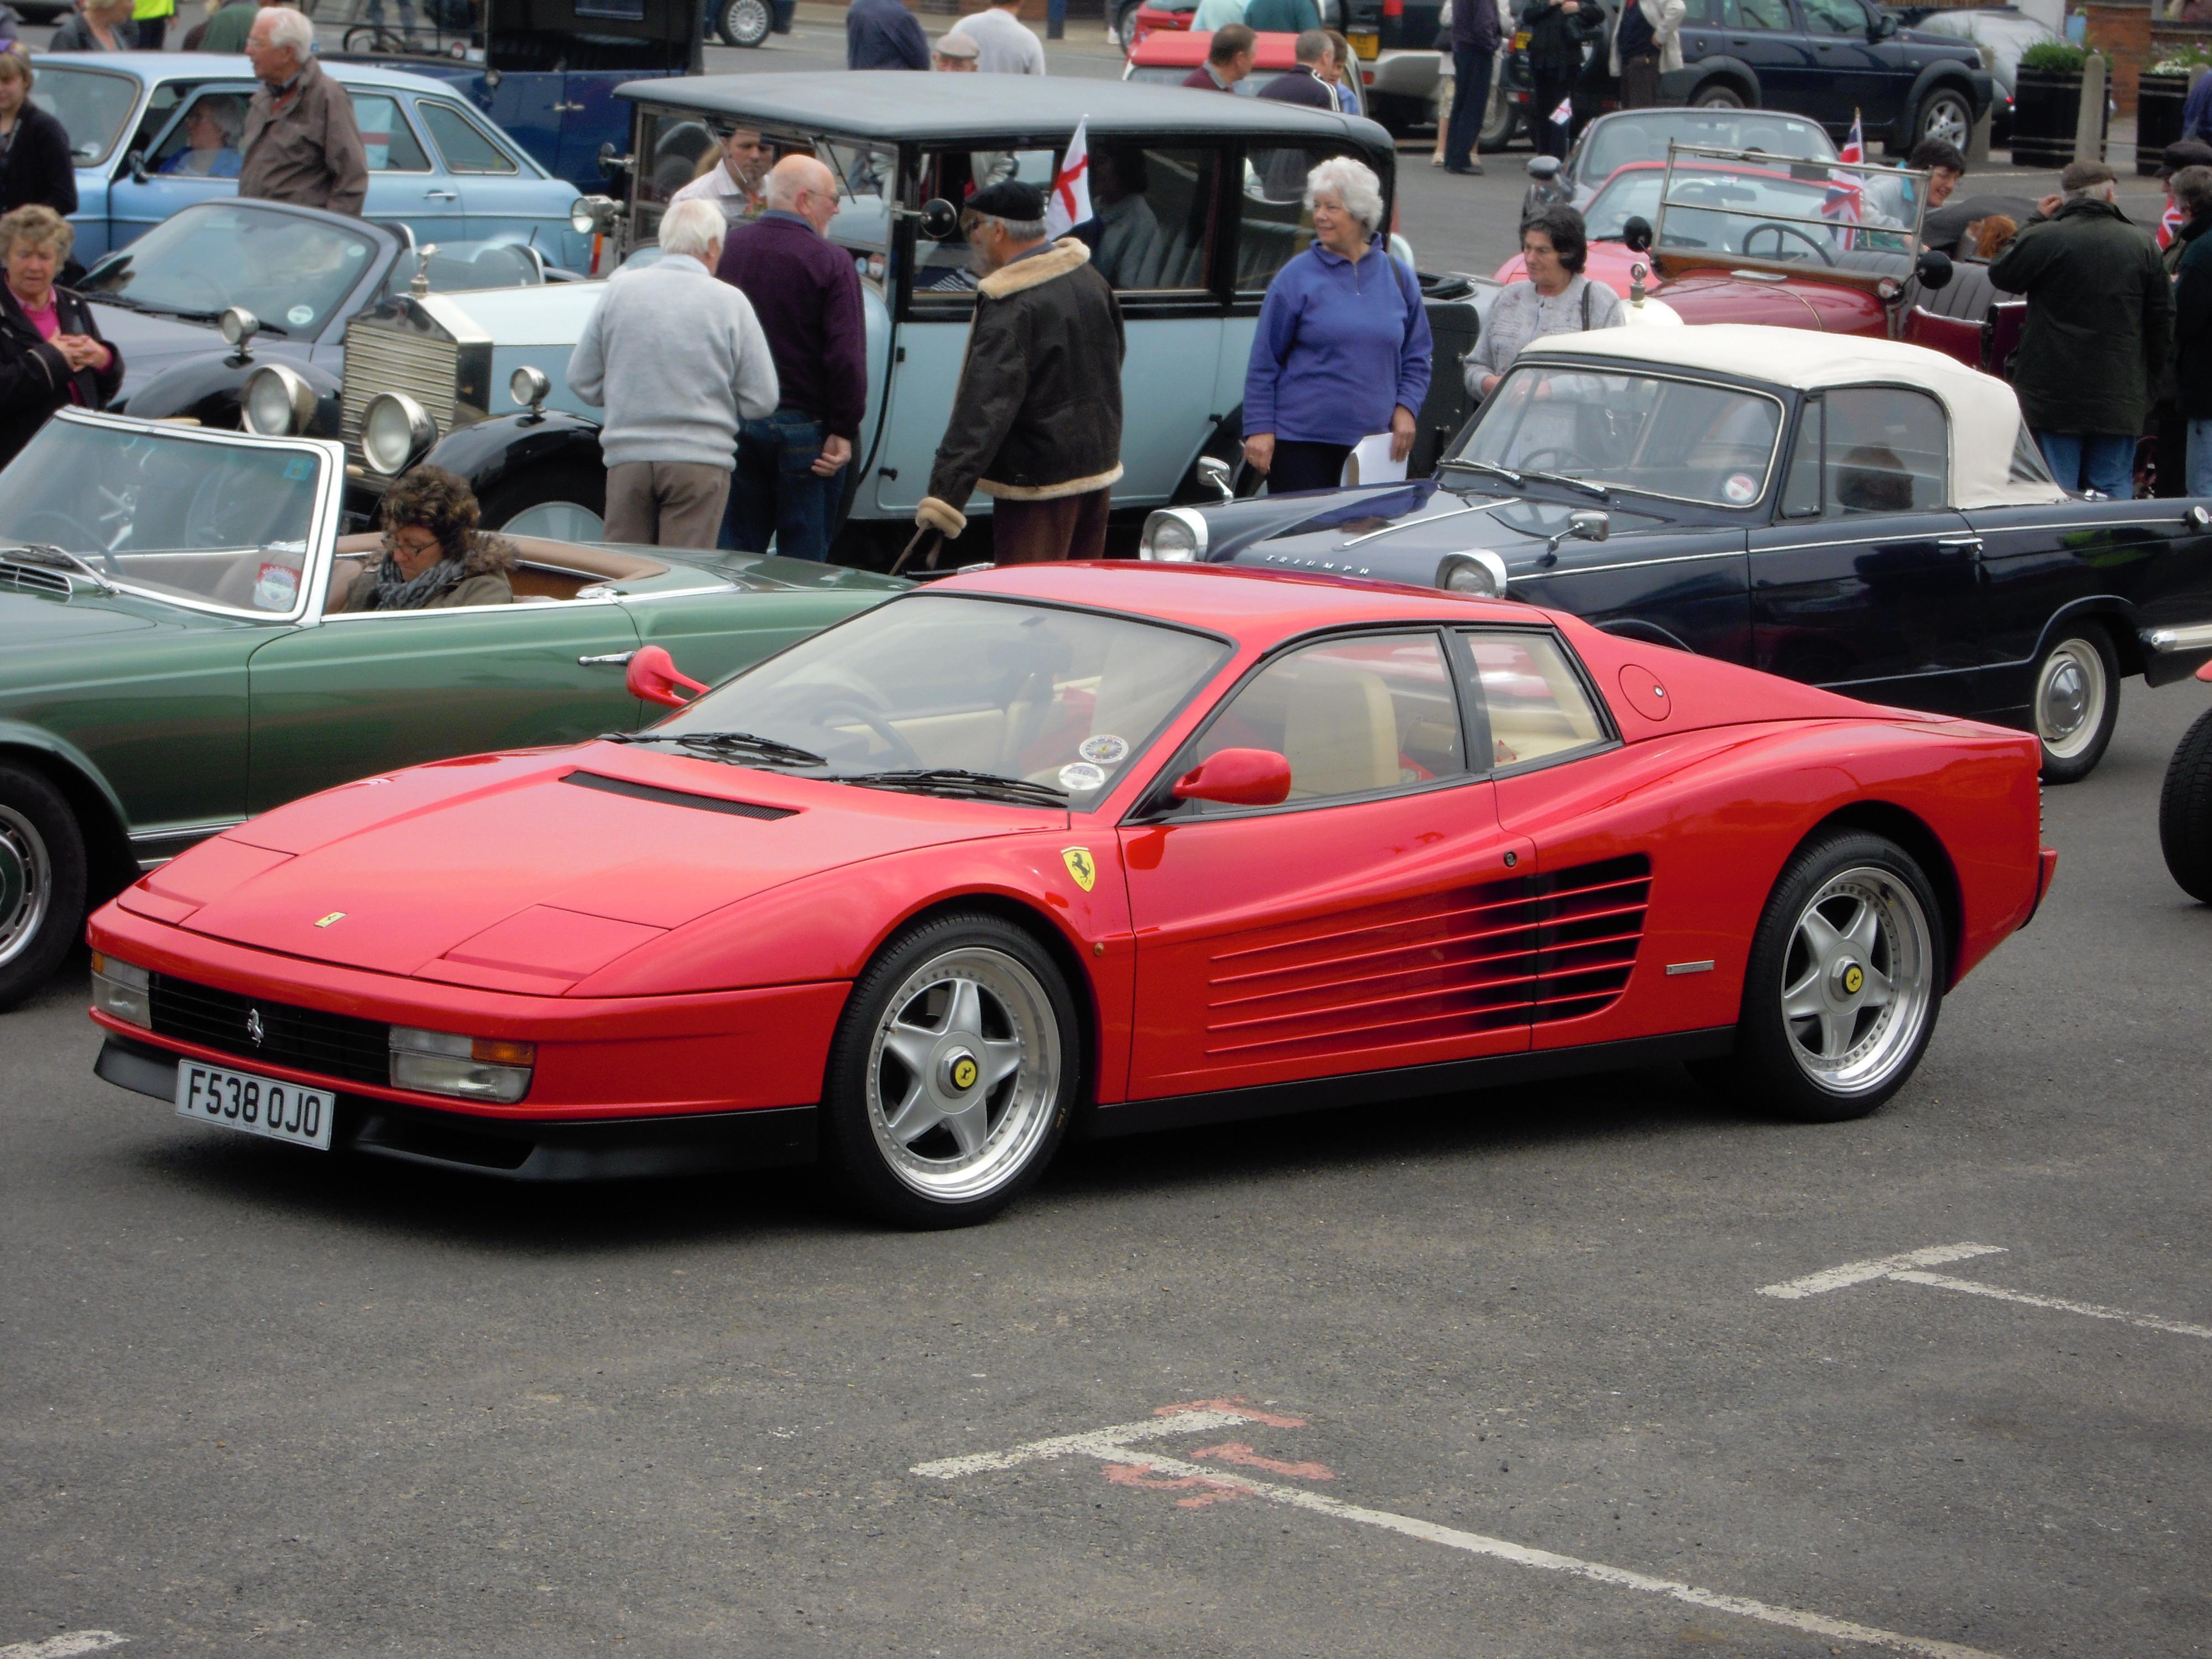 A_Ferrari_Testarossa_Classic_Car_Rally,_